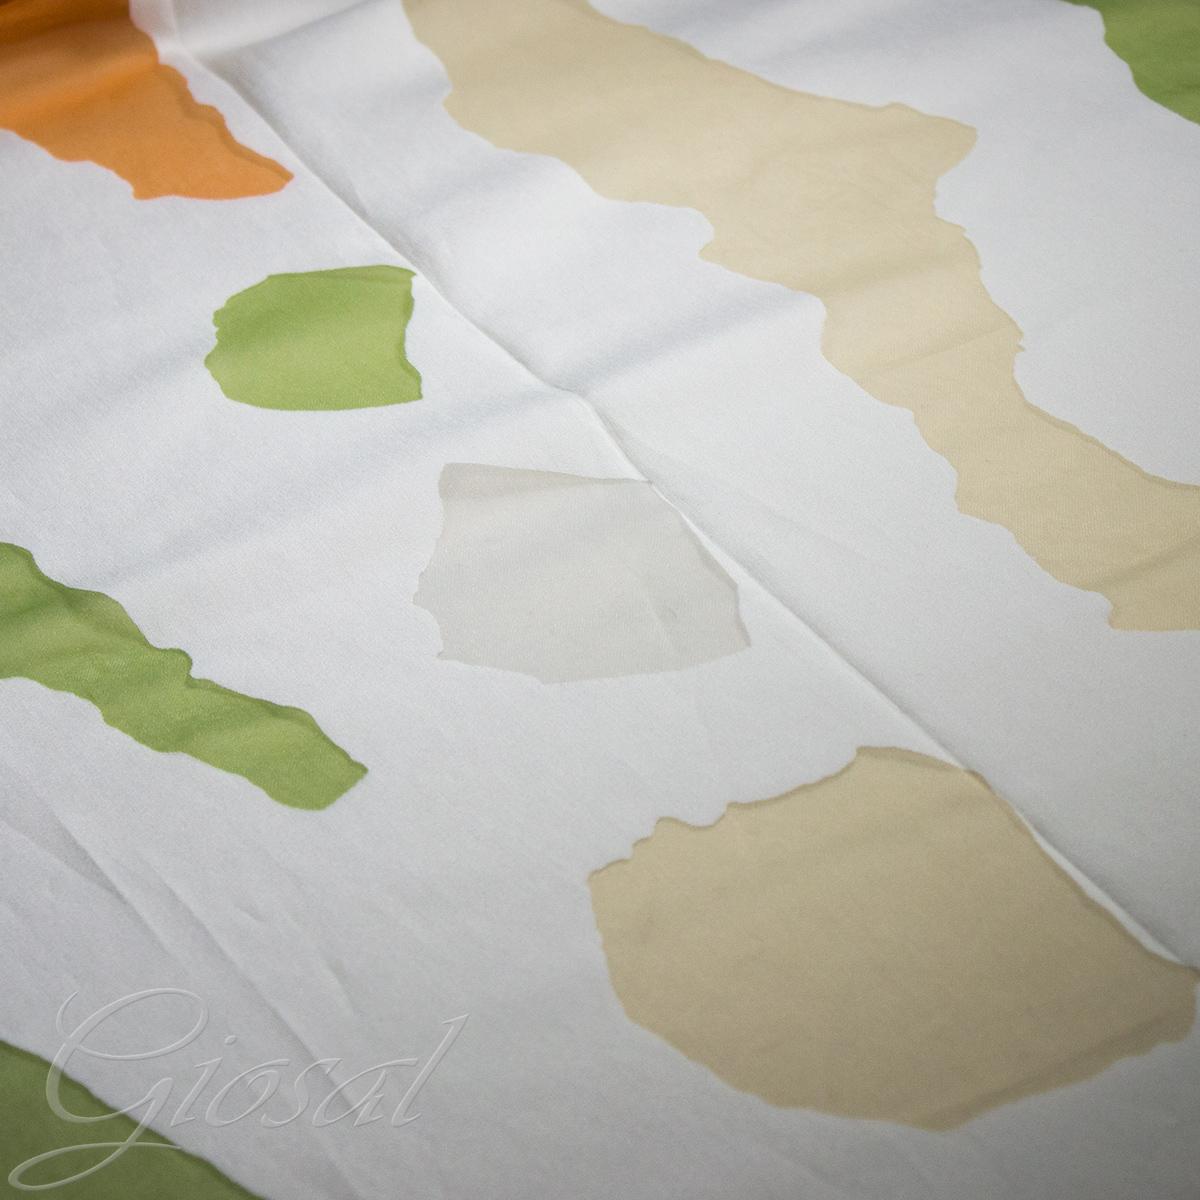 Tessuto-Per-Tenda-Arredo-Tendaggi-Pannello-Telo-Kendra-Verde-Jelosia-GIOSAL miniatura 3